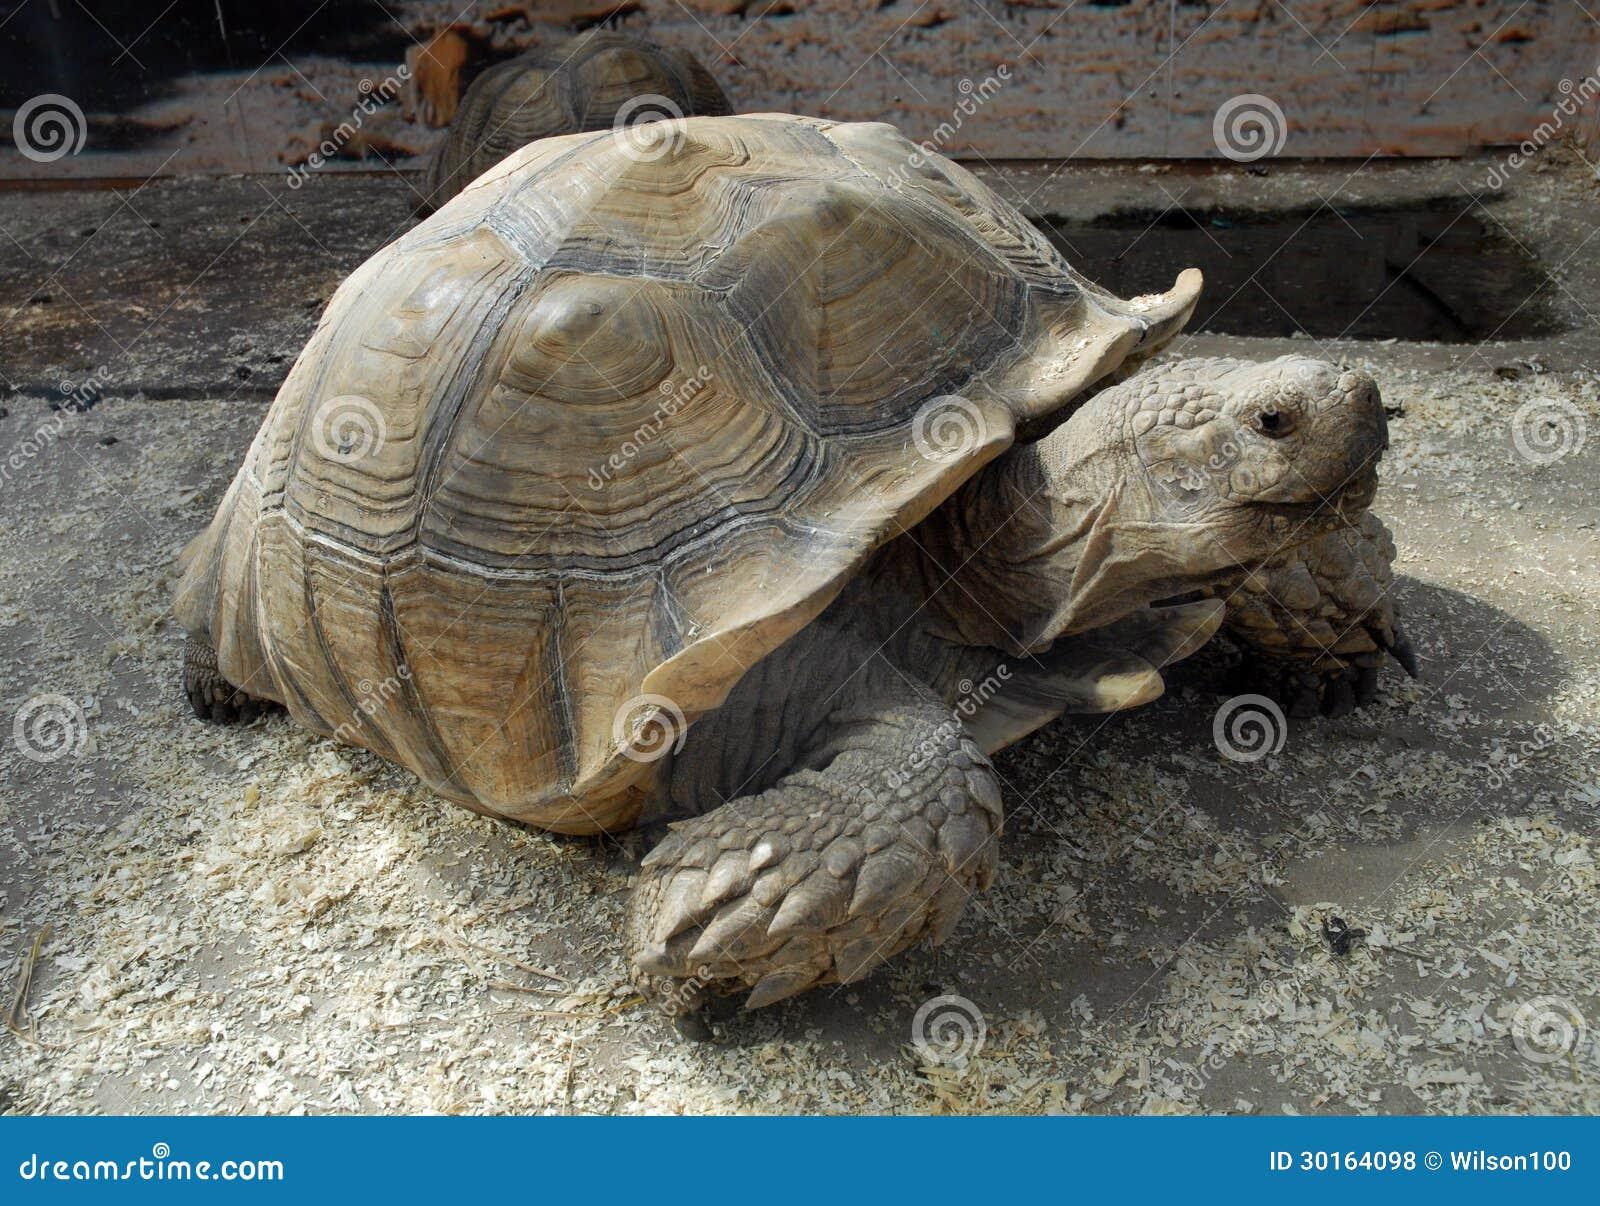 Giant Tortoise Royalty Free Stock Photos - Image: 30164098